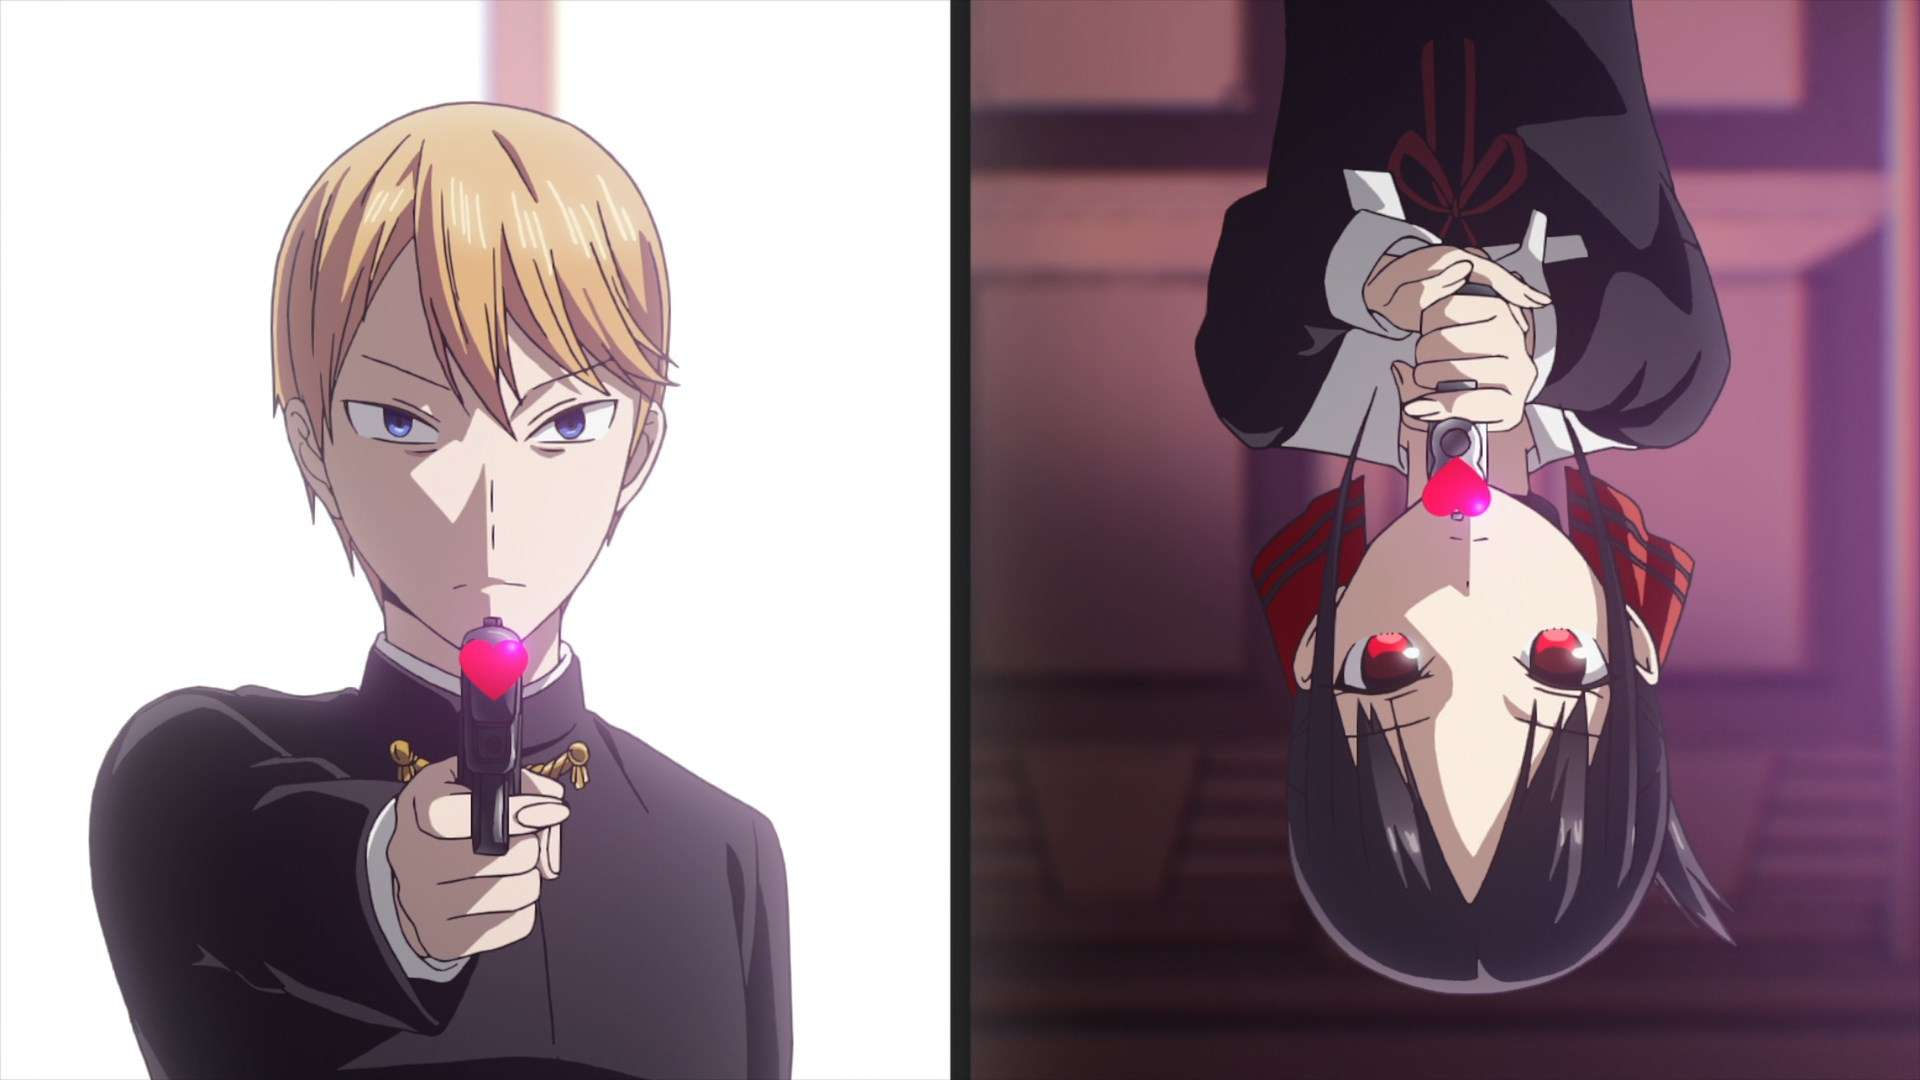 Anime Kaguya-sama wa Kokusaretai